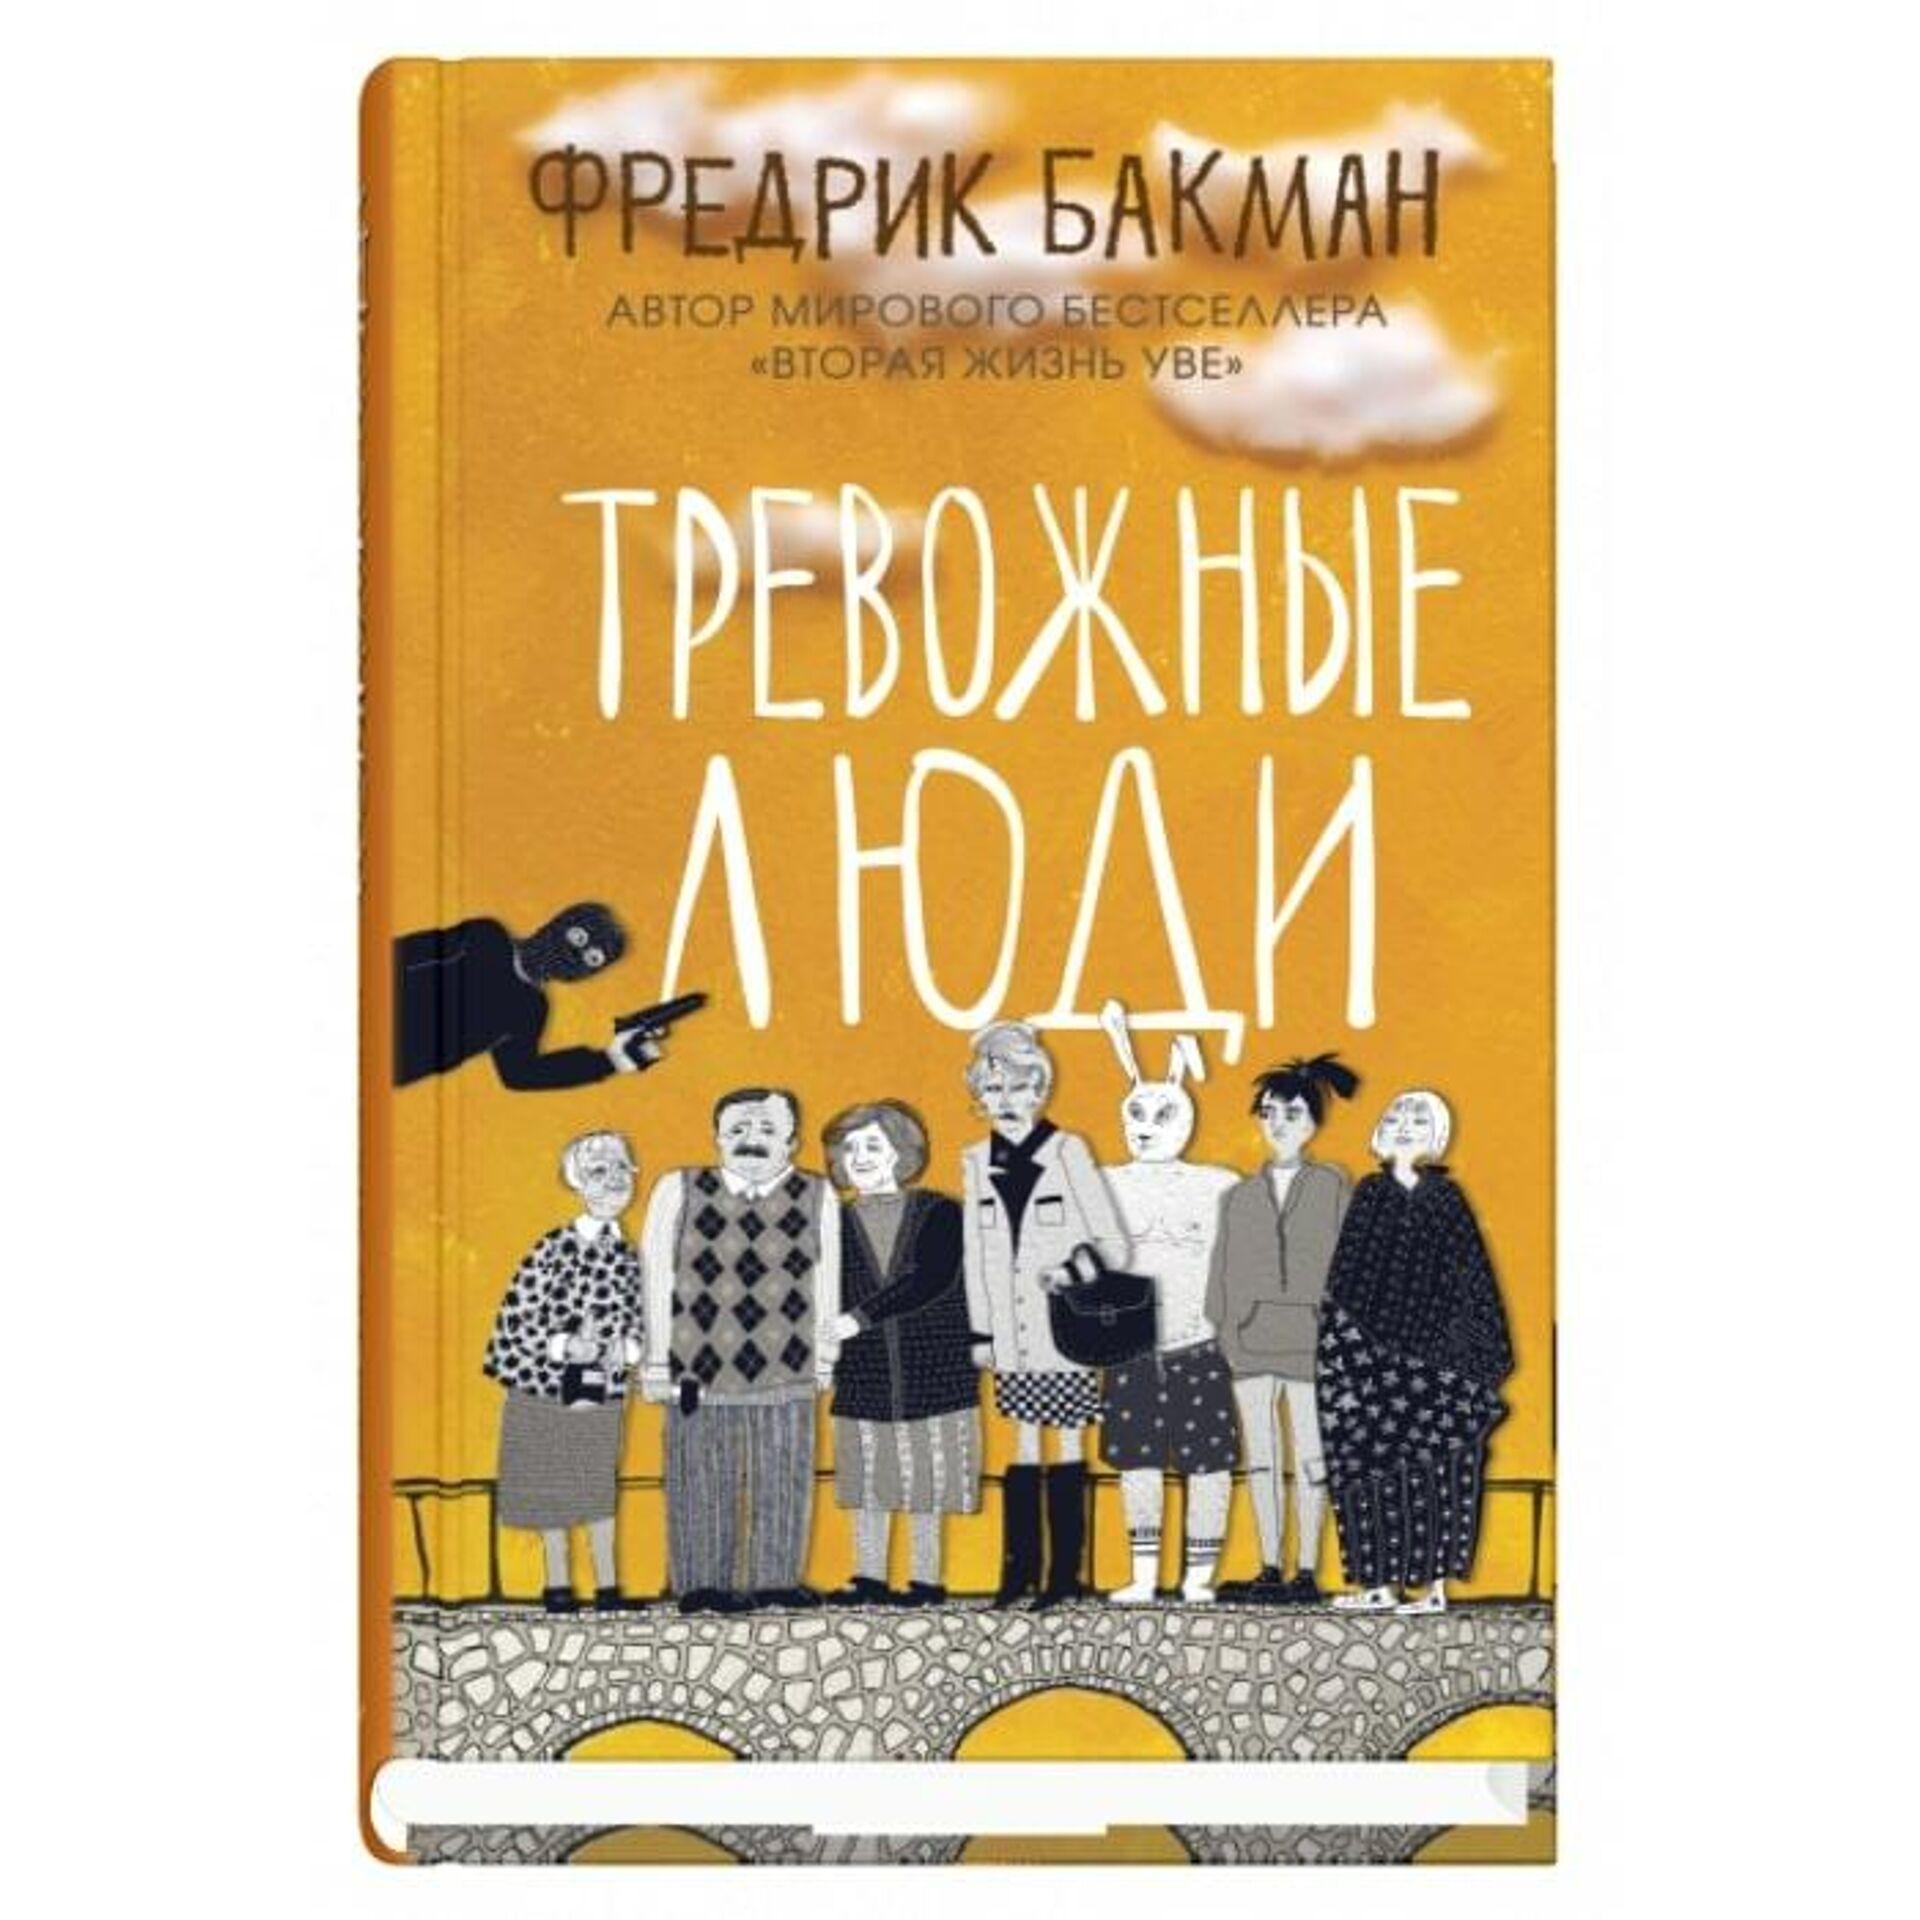 Обложка книги Тревожные люди Фредрика Бакмана - РИА Новости, 1920, 01.12.2020